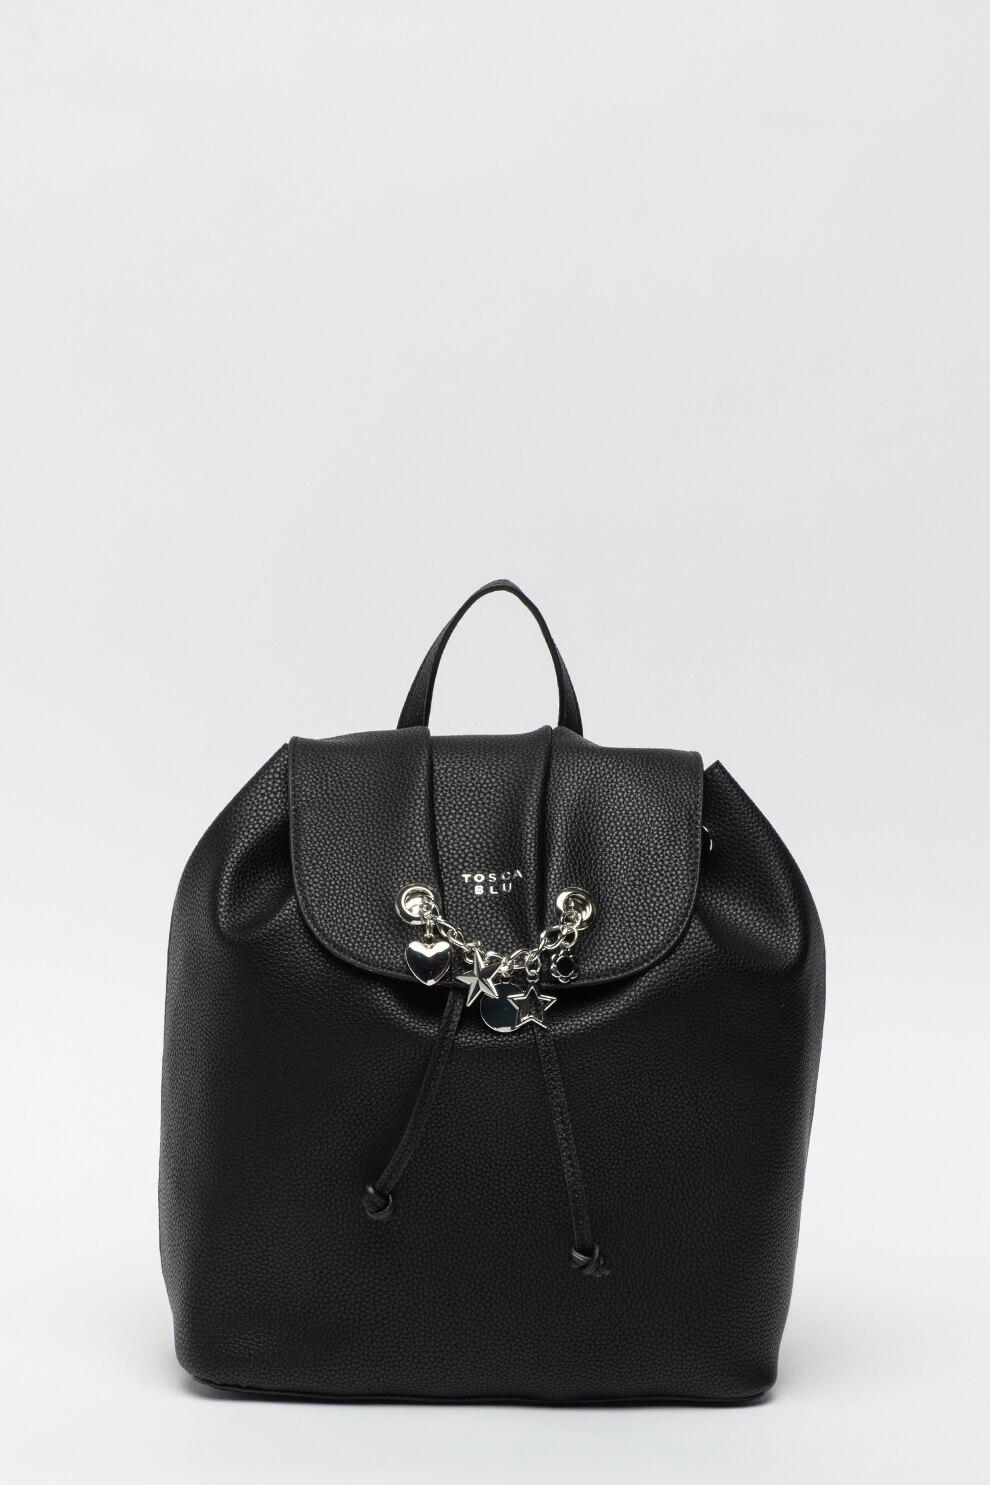 Fotografie Tosca Blu, Rucsac de piele ecologica, cu accesoriu decorativ Menta, Negru/Argintiu